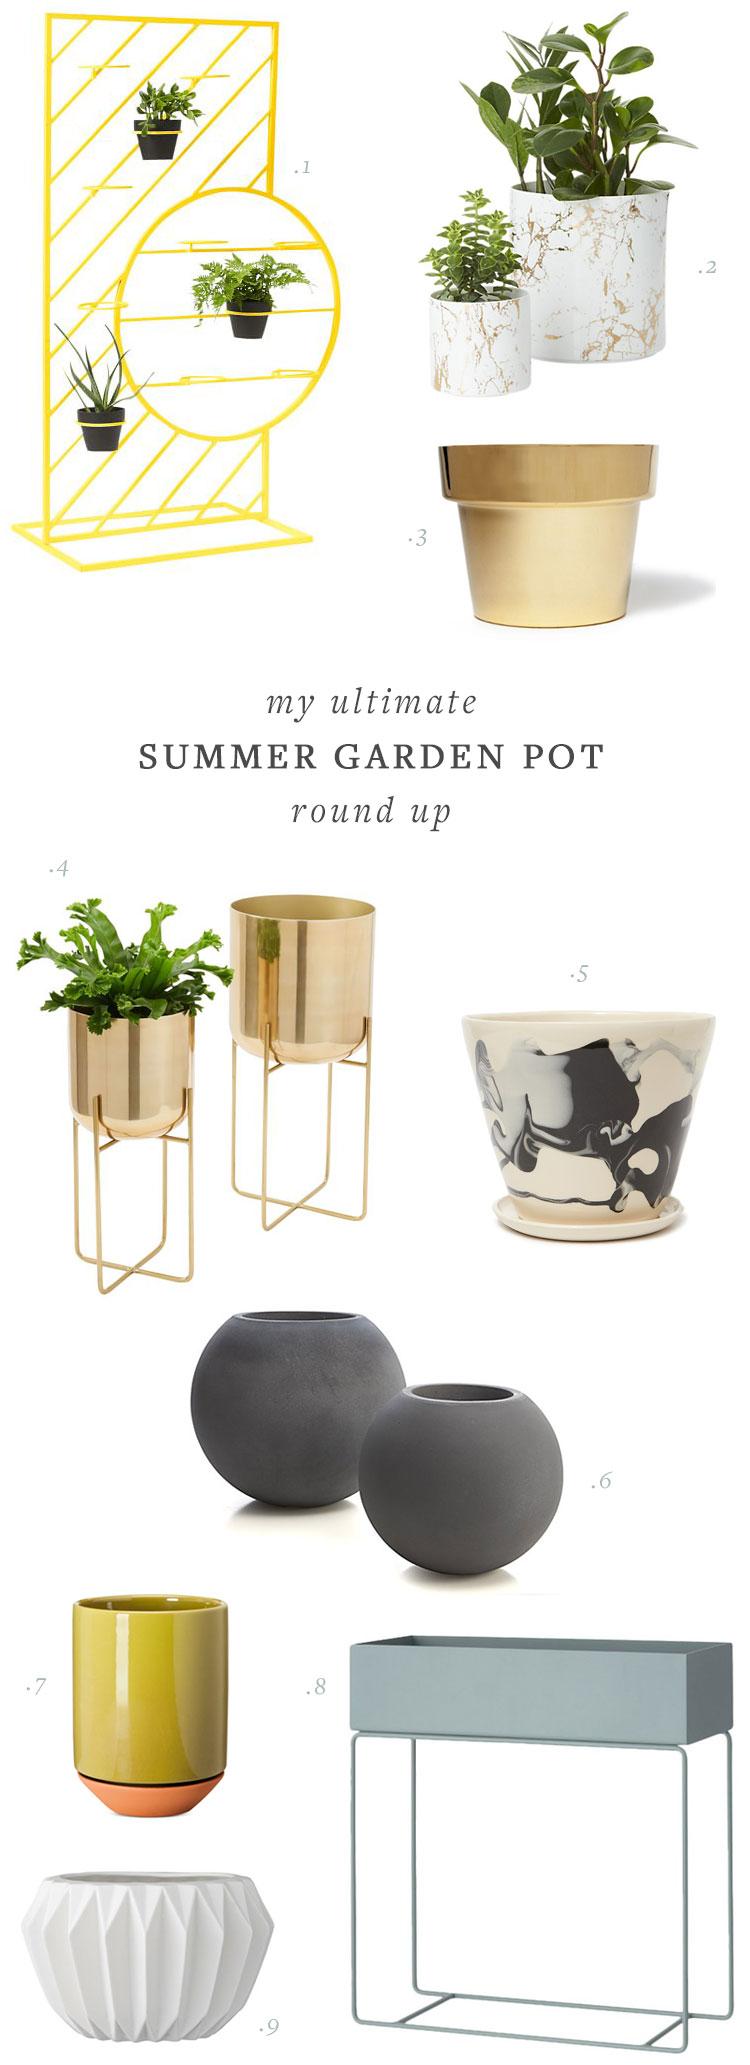 jojotastic - my ultimate summer garden pot round up on